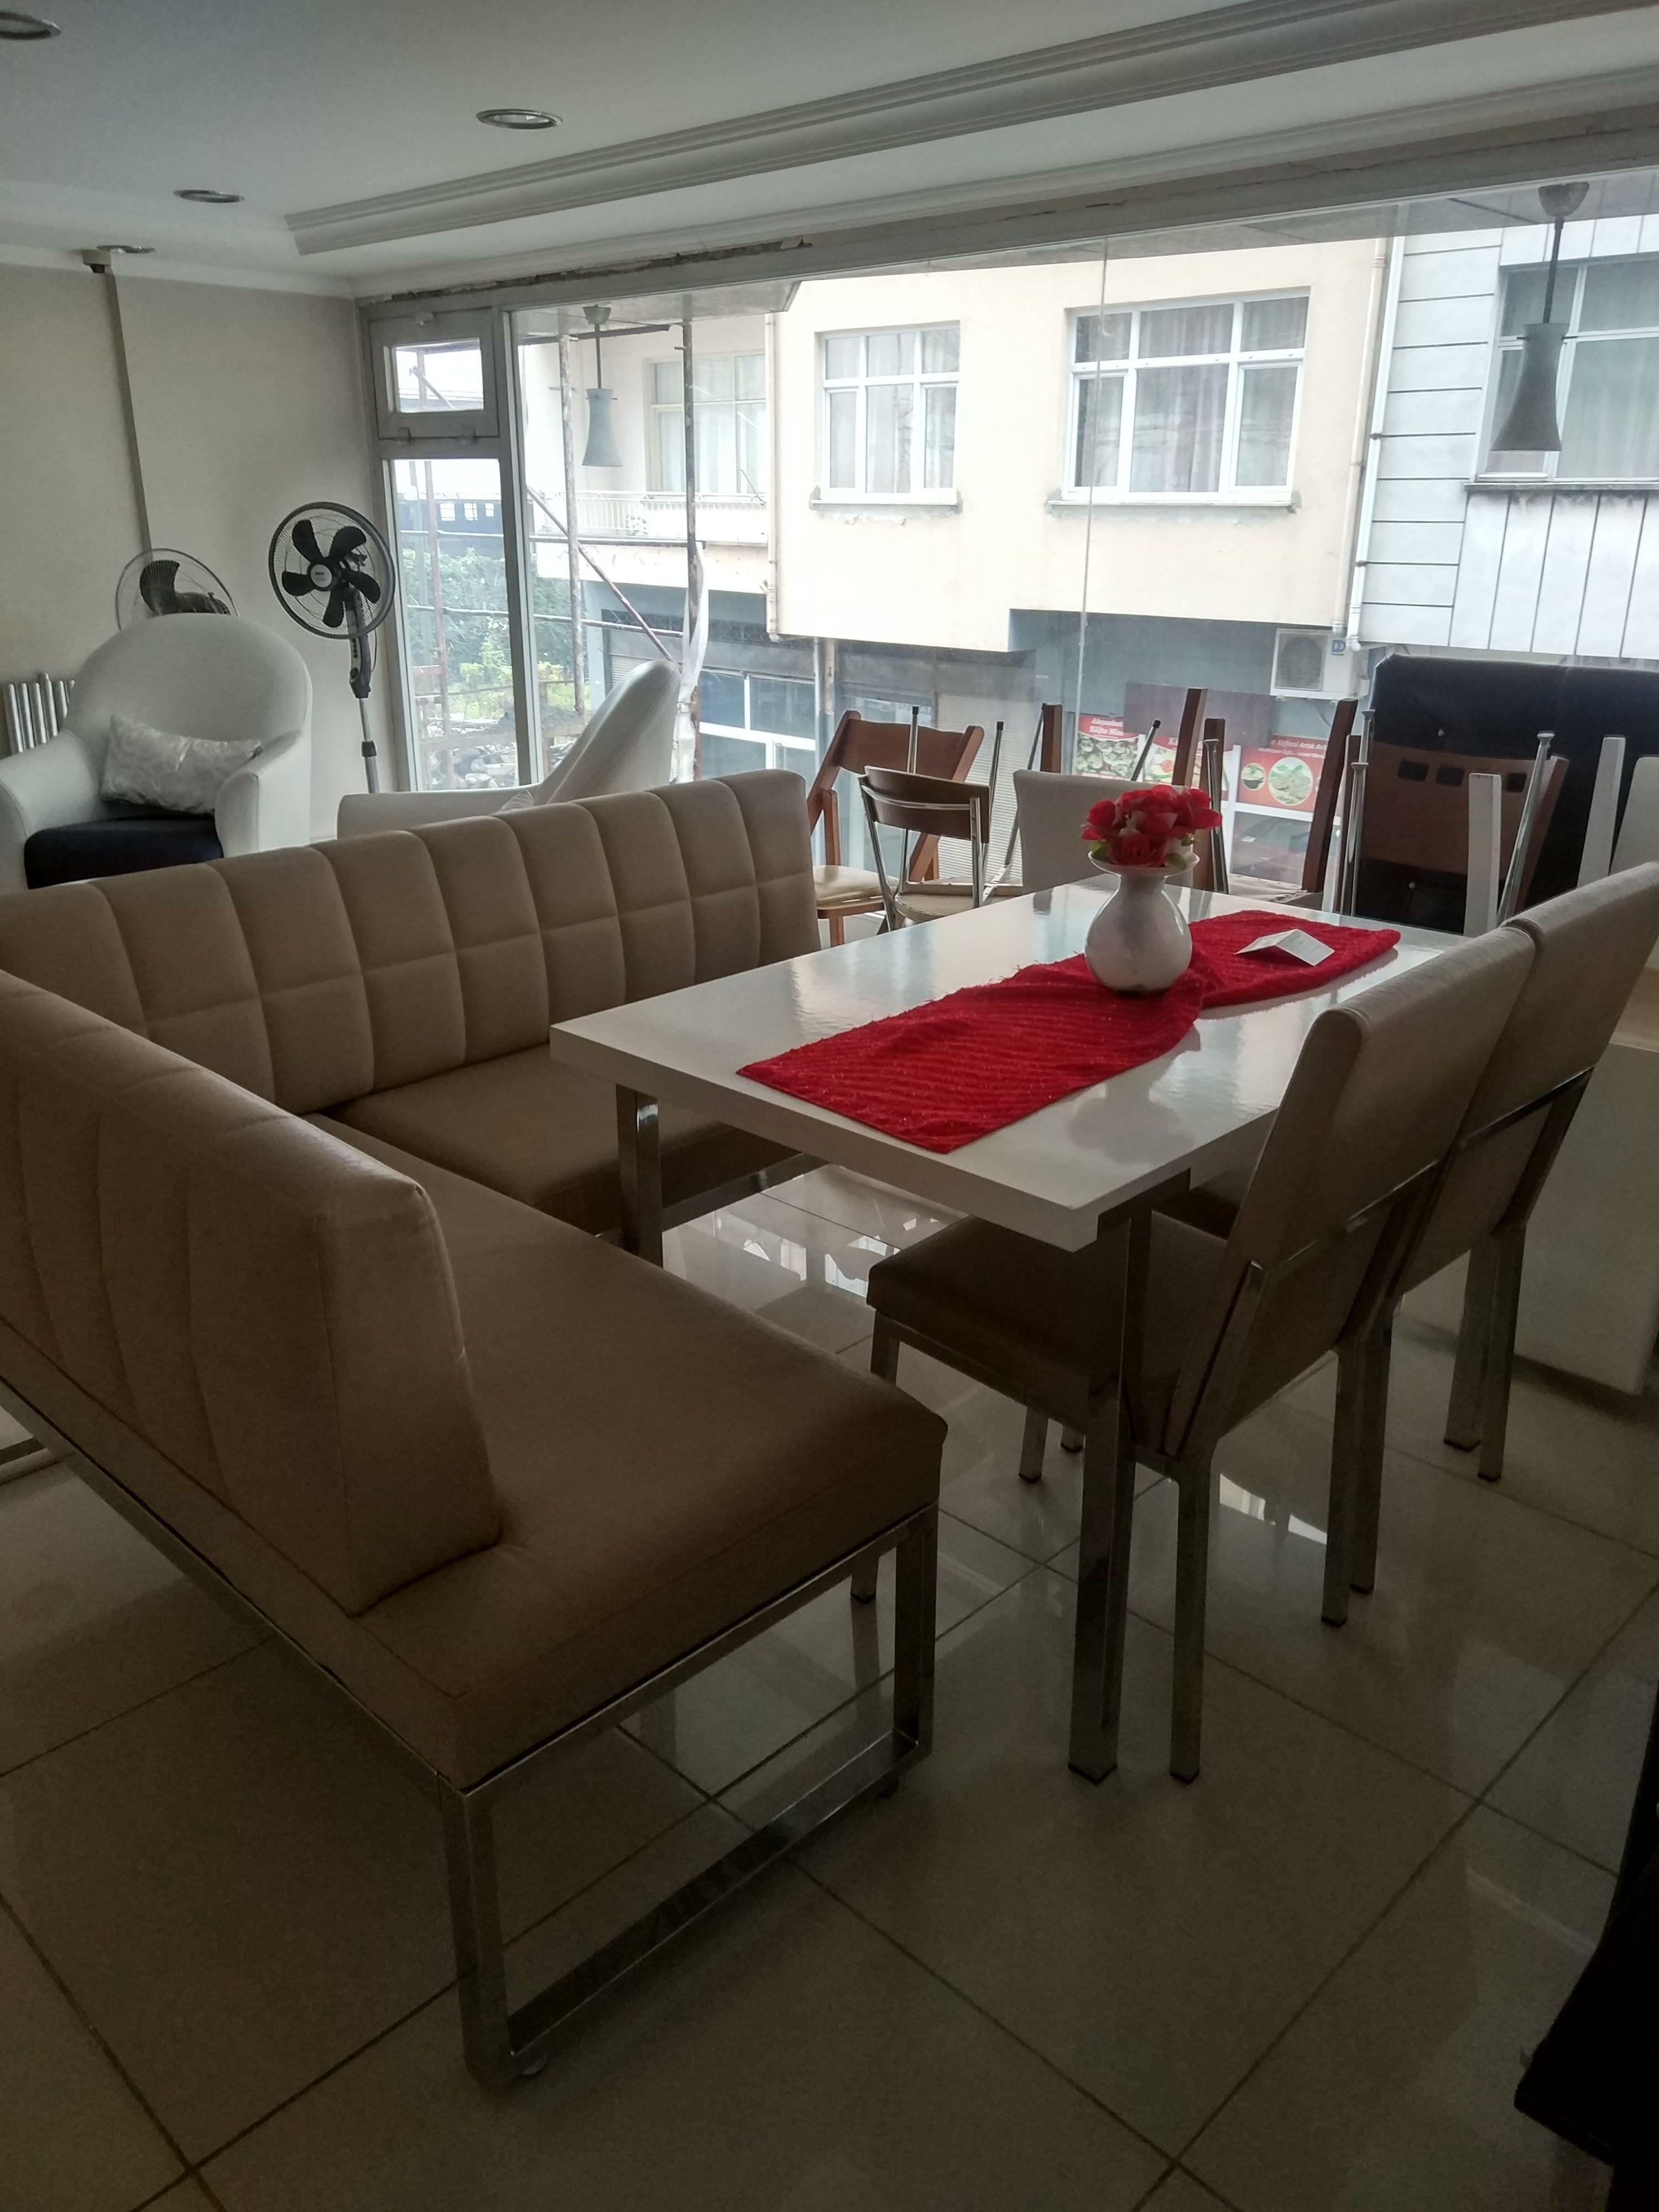 Mutfak Kose Takimi Home Furniture Sofa